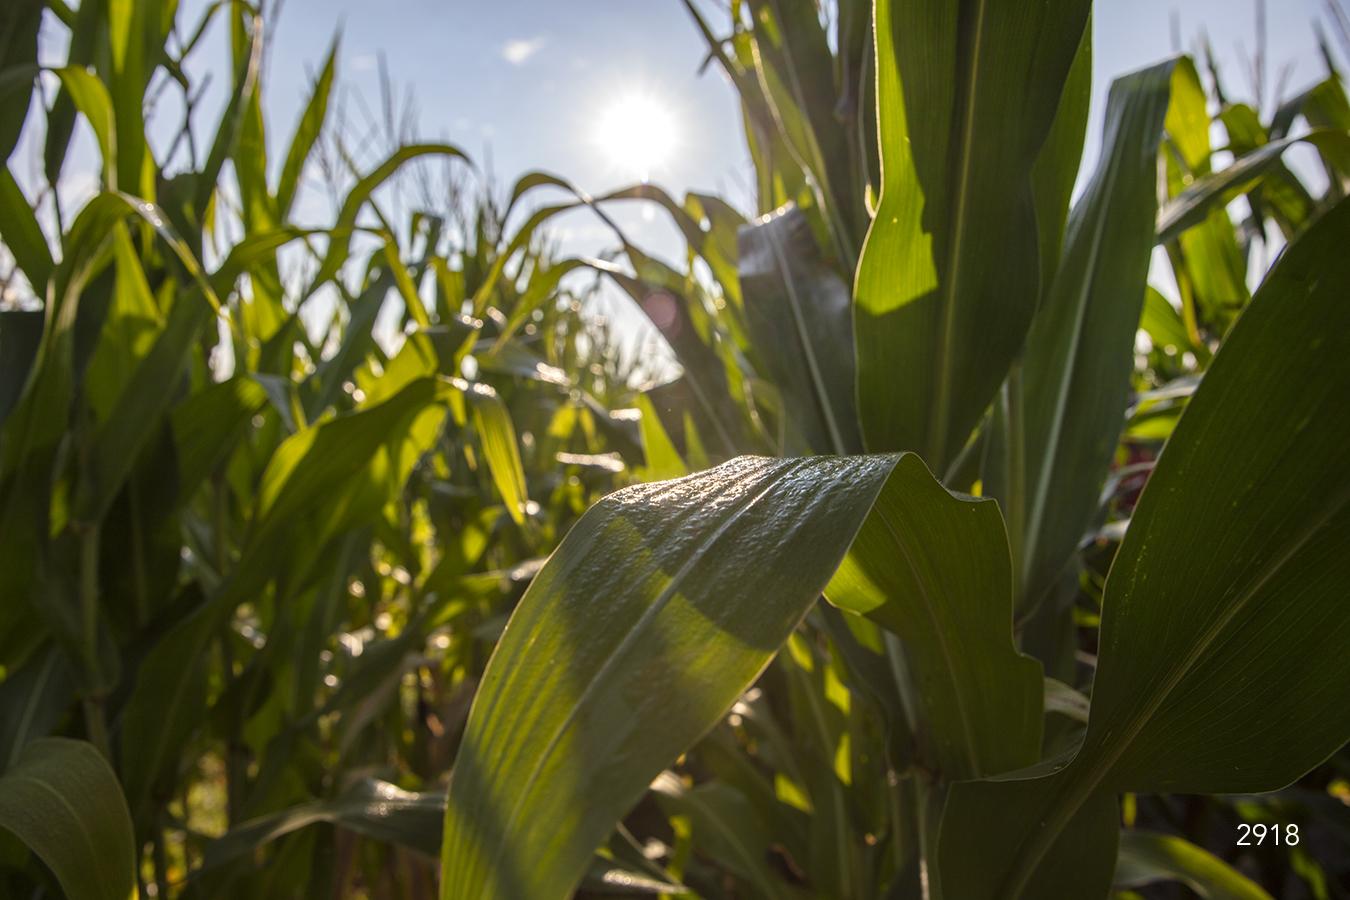 green leaves corn field grass grasses midwest prairie